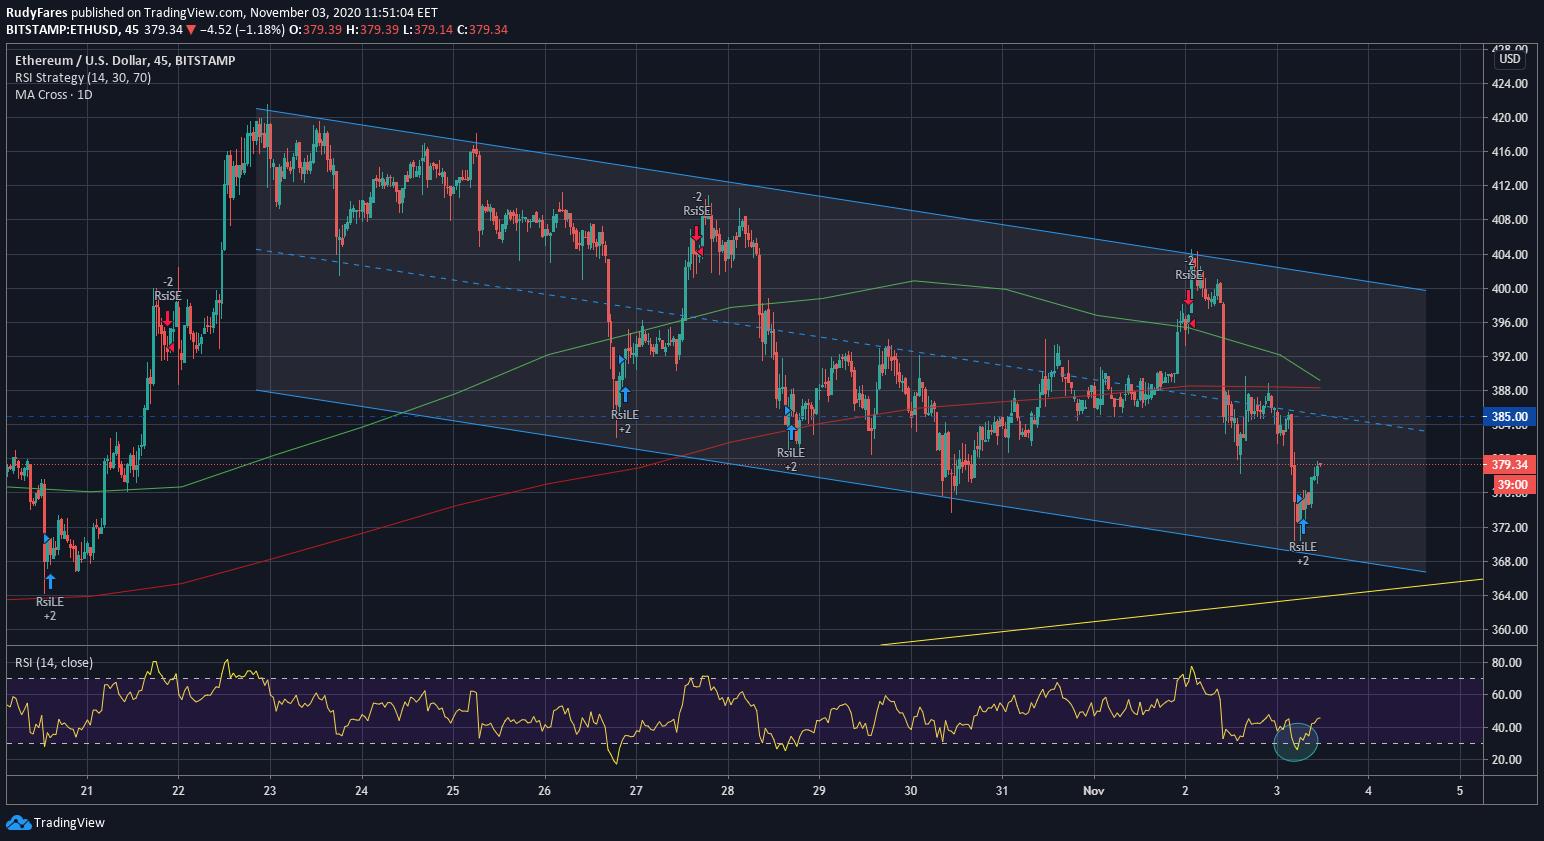 BTC/USD price 45MIN chart, downward channel trend